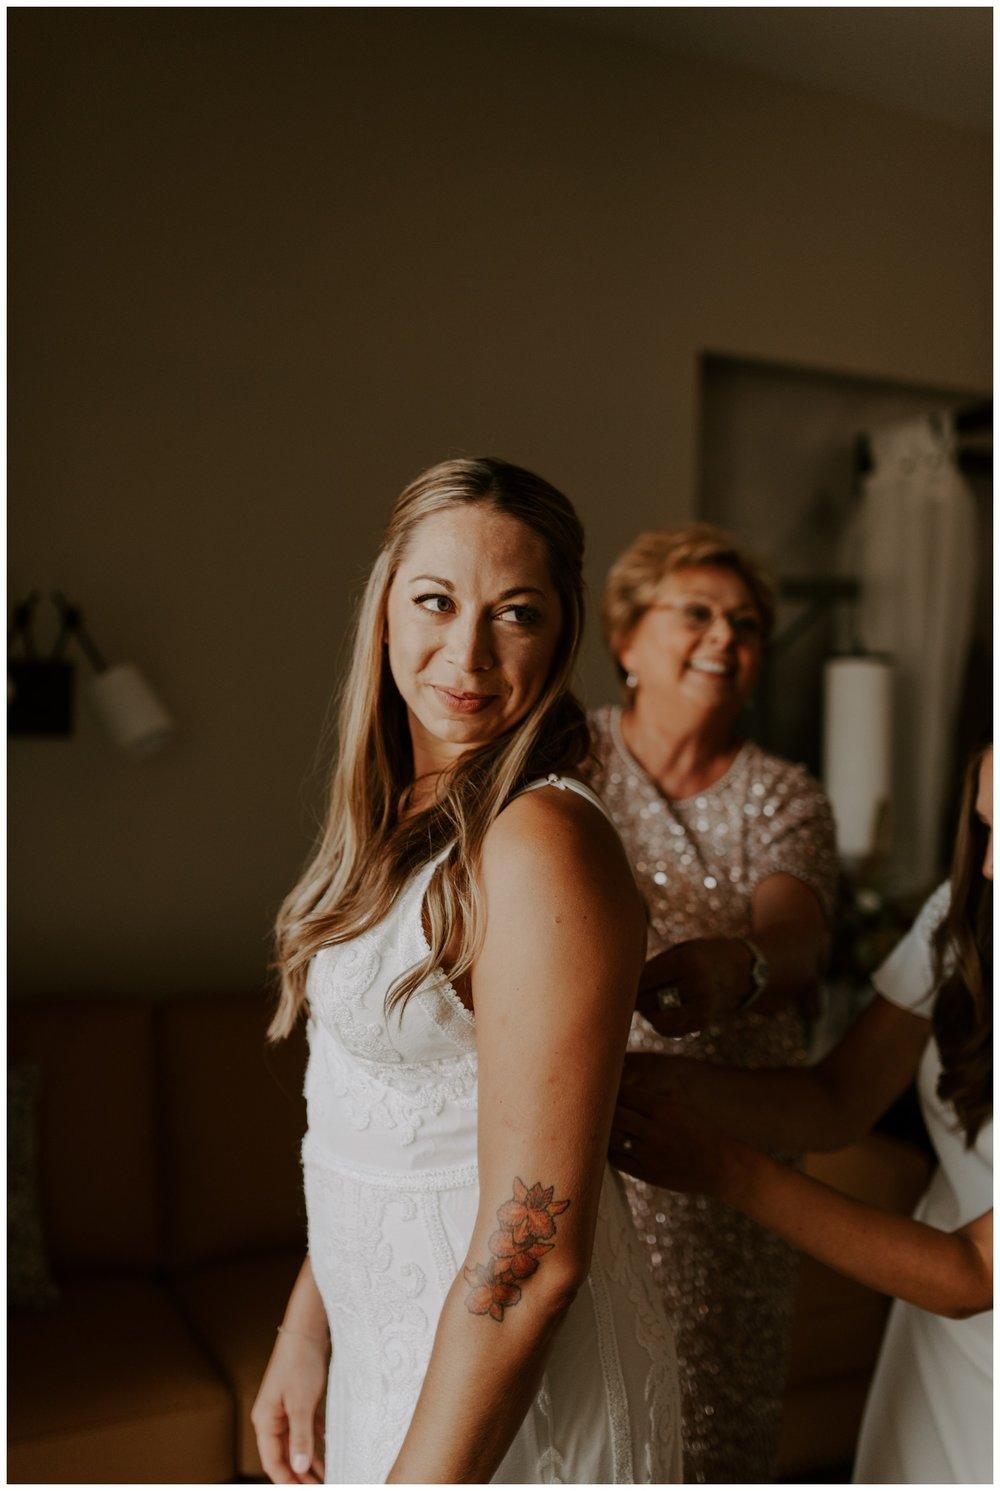 Napa Valley Backyard Wedding and Reception at Elizabeth Spencer Winery | Jessica Heron Images 019.jpg